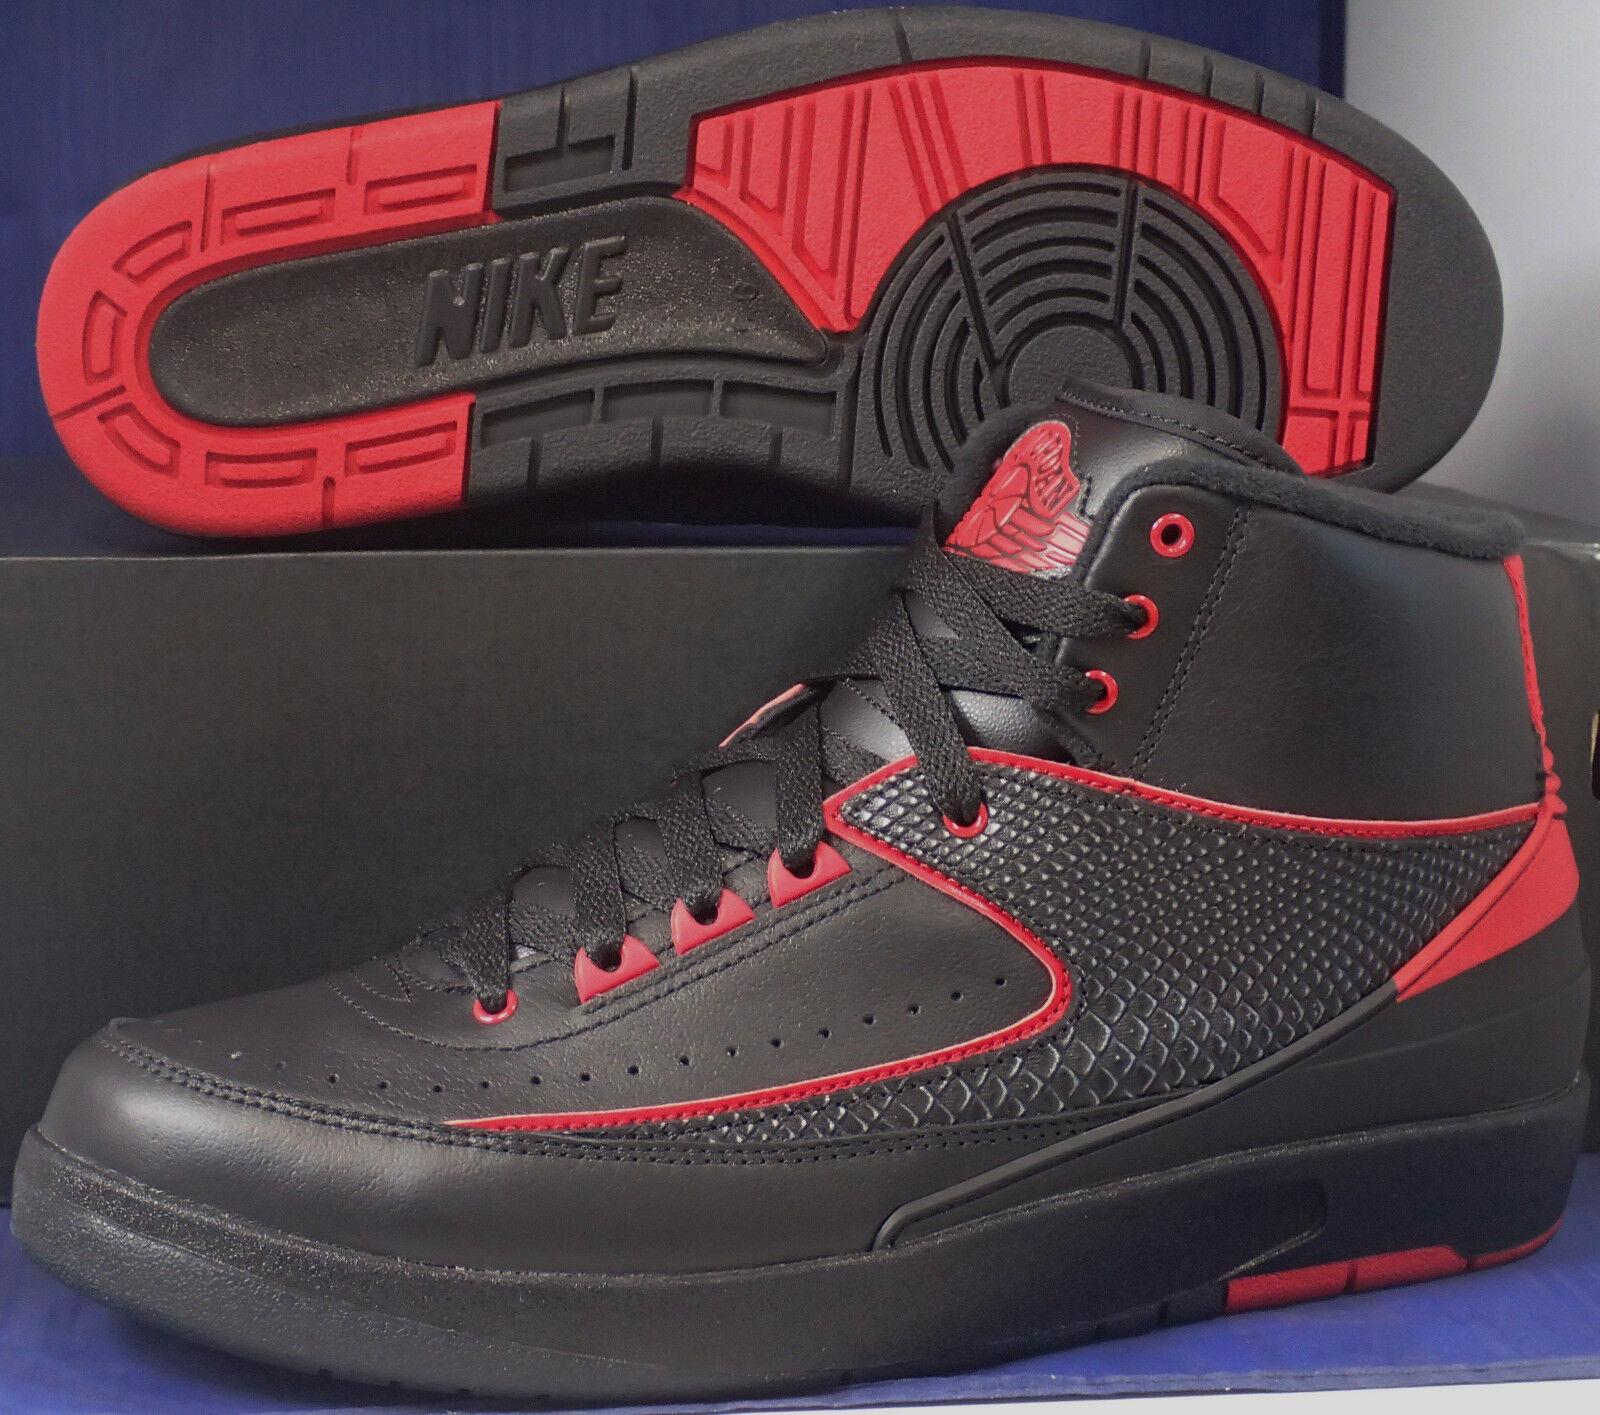 Nike Air Jordan 87 2 I Retro Alternativa 87 Jordan Negro Rojo Universitario Talle 811.5 (834274001) 5b5276